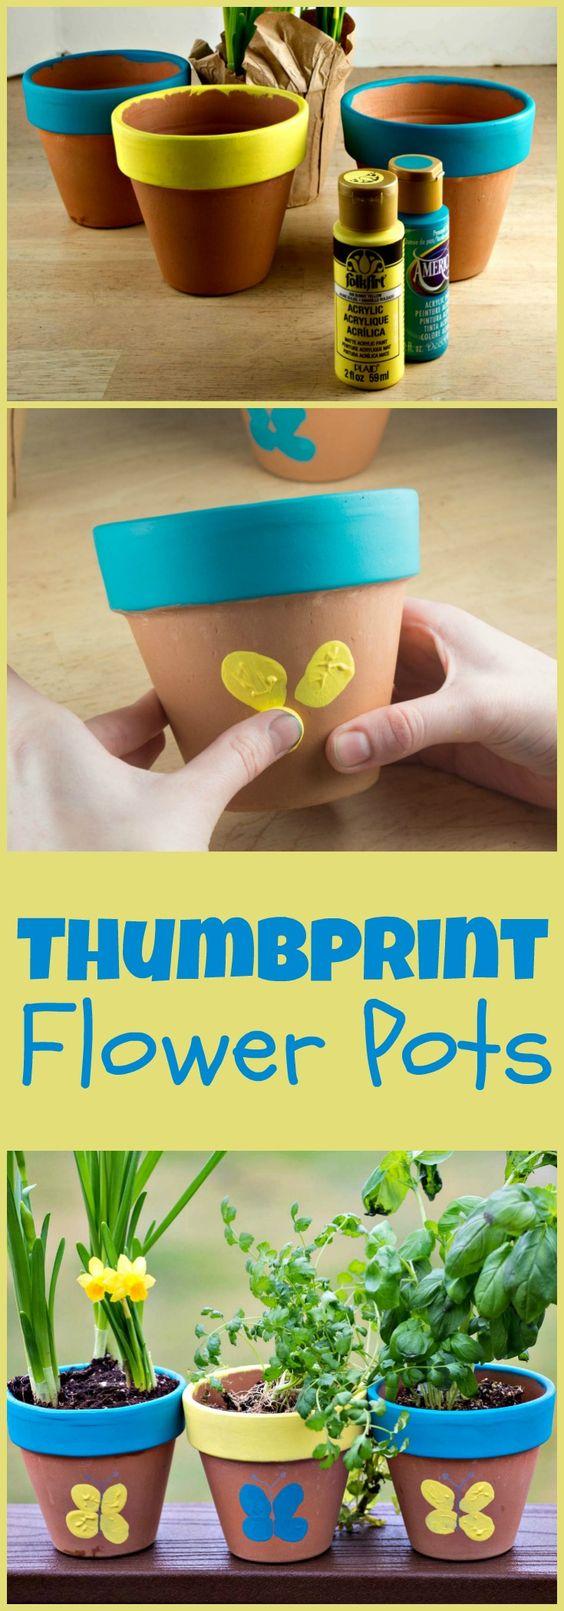 Thumbprint Flower Pot.